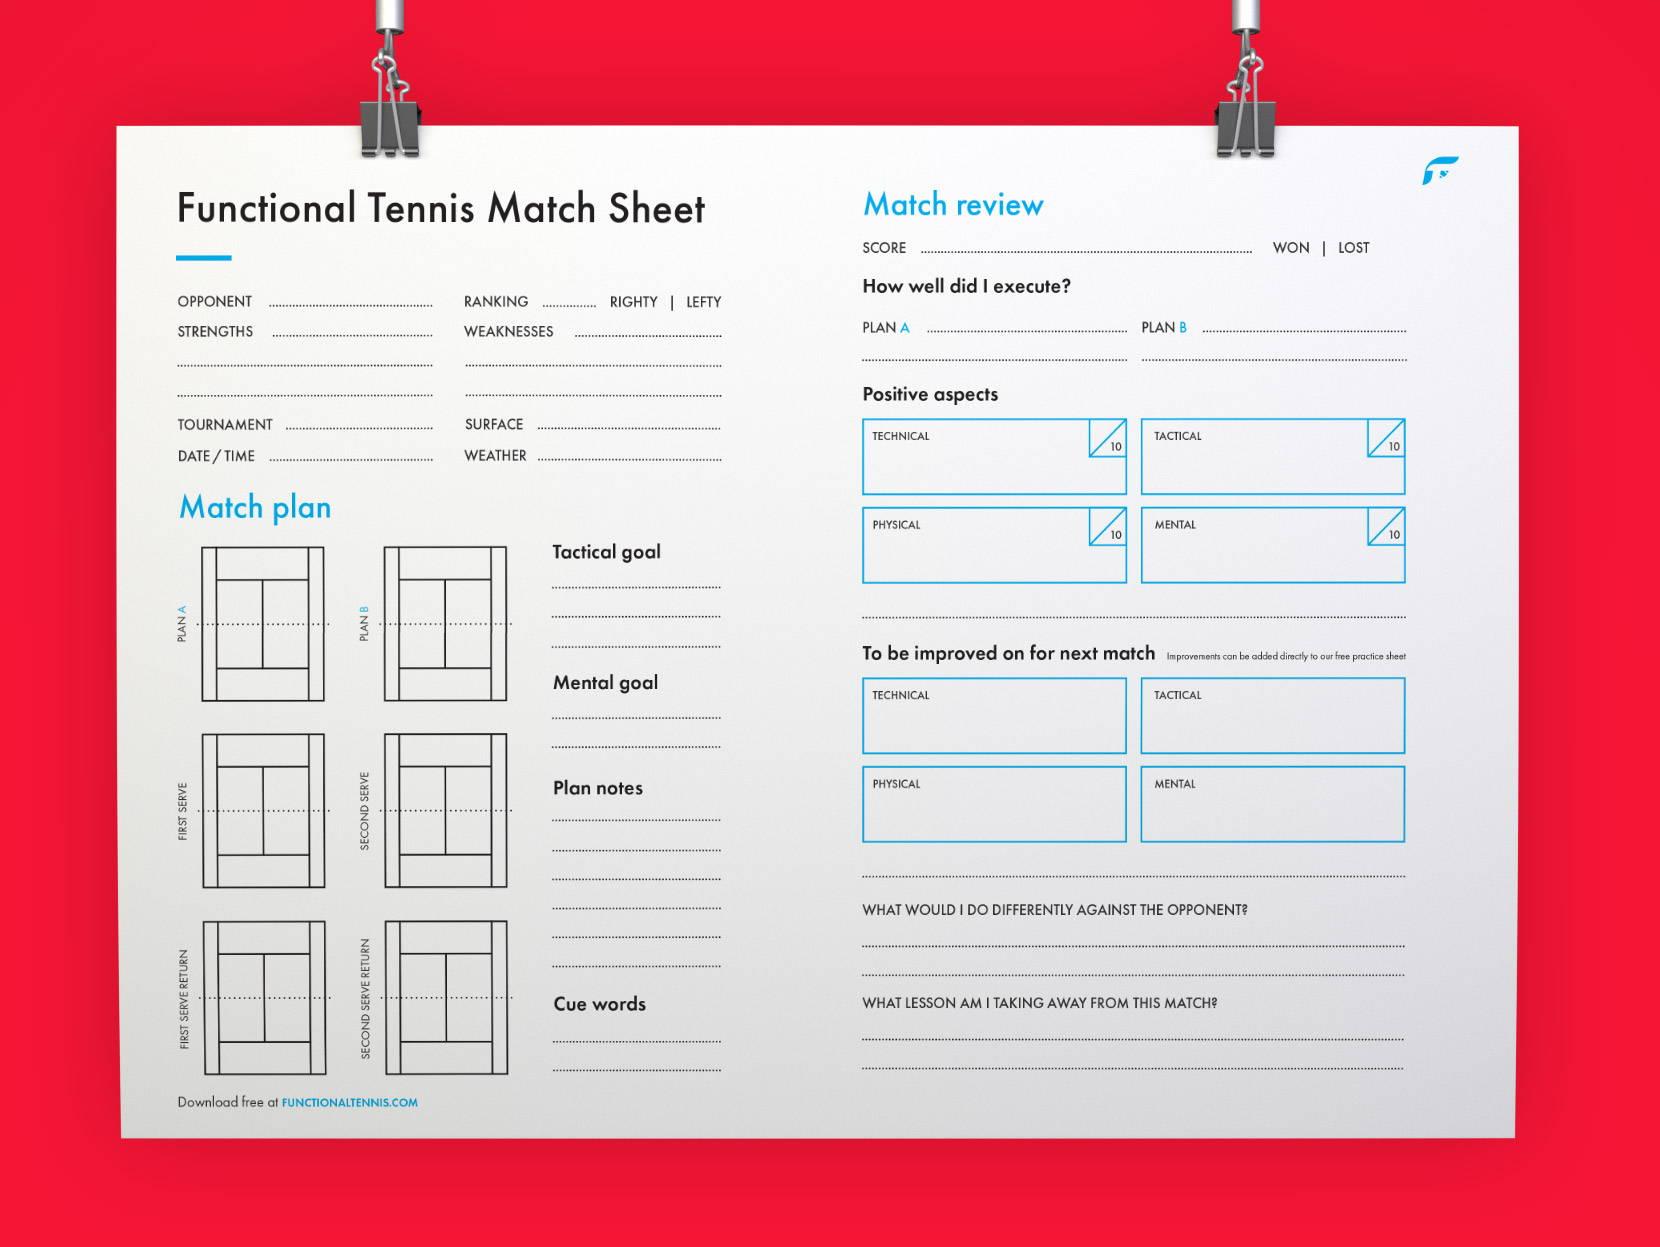 The updated Functional tennis match sheet